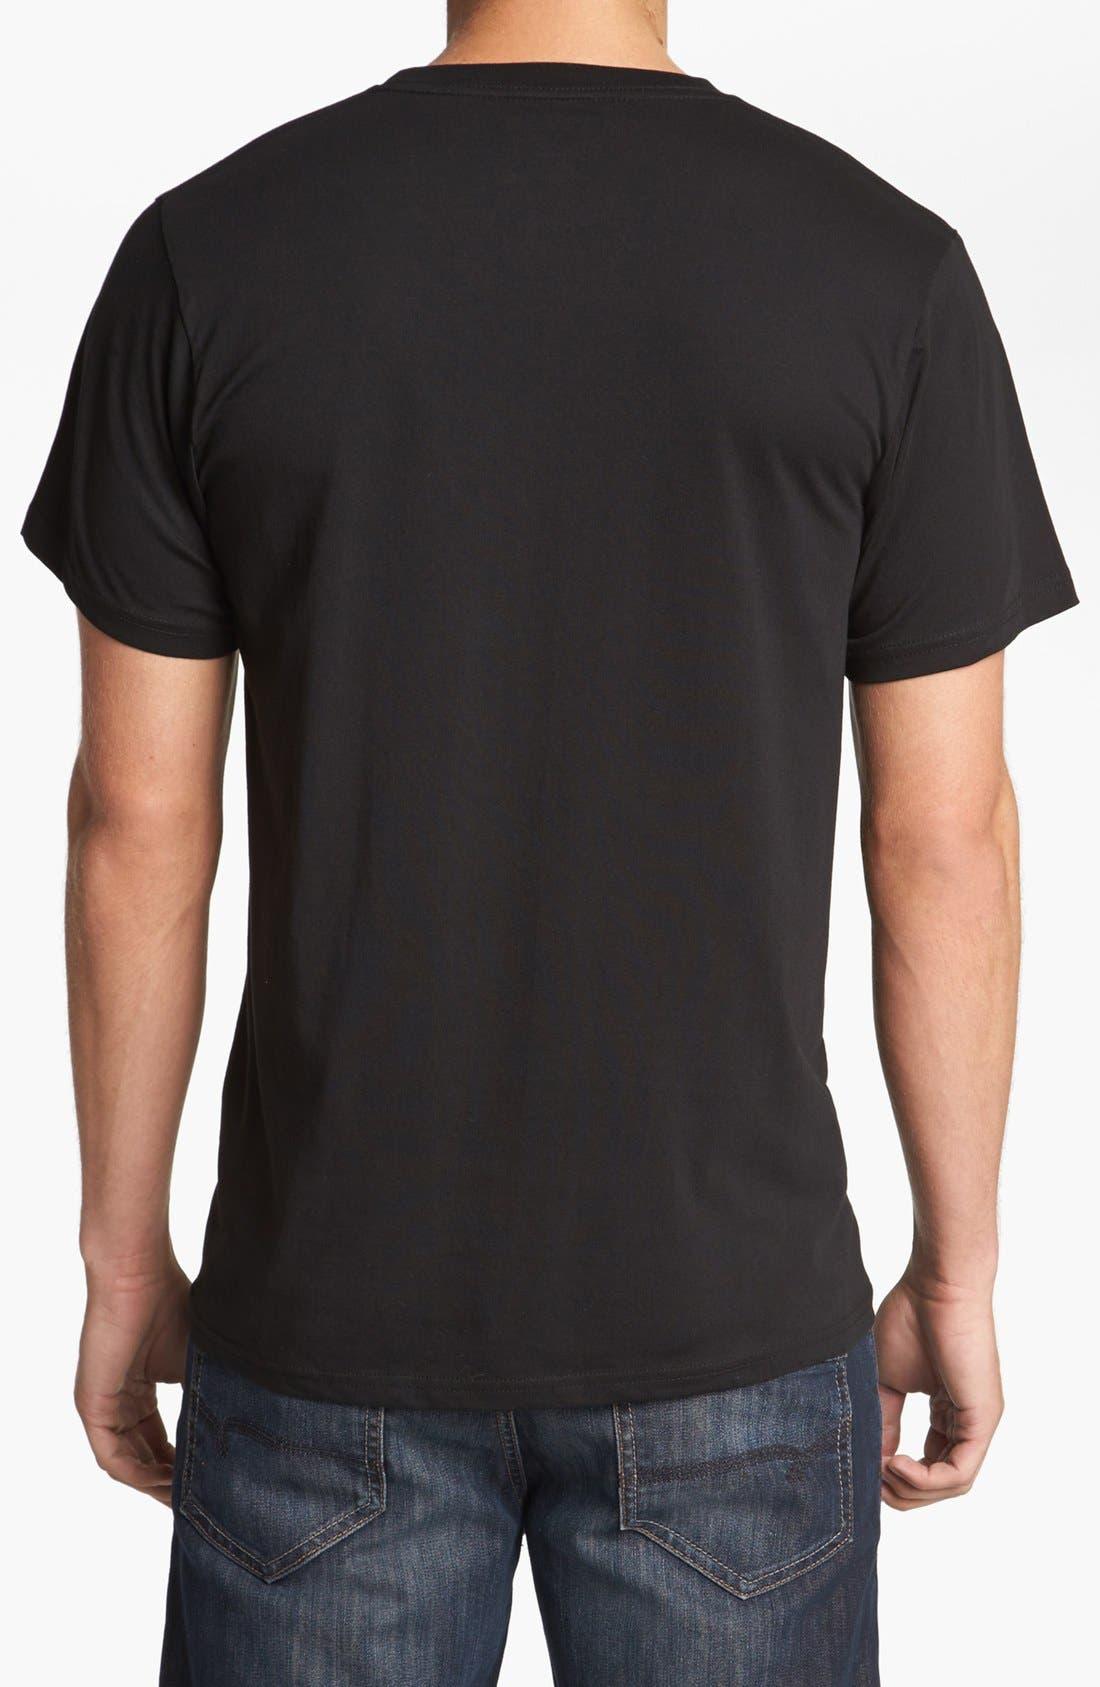 Alternate Image 2  - Horses Cut Shop 'Downtown Boxing Gym' T-Shirt